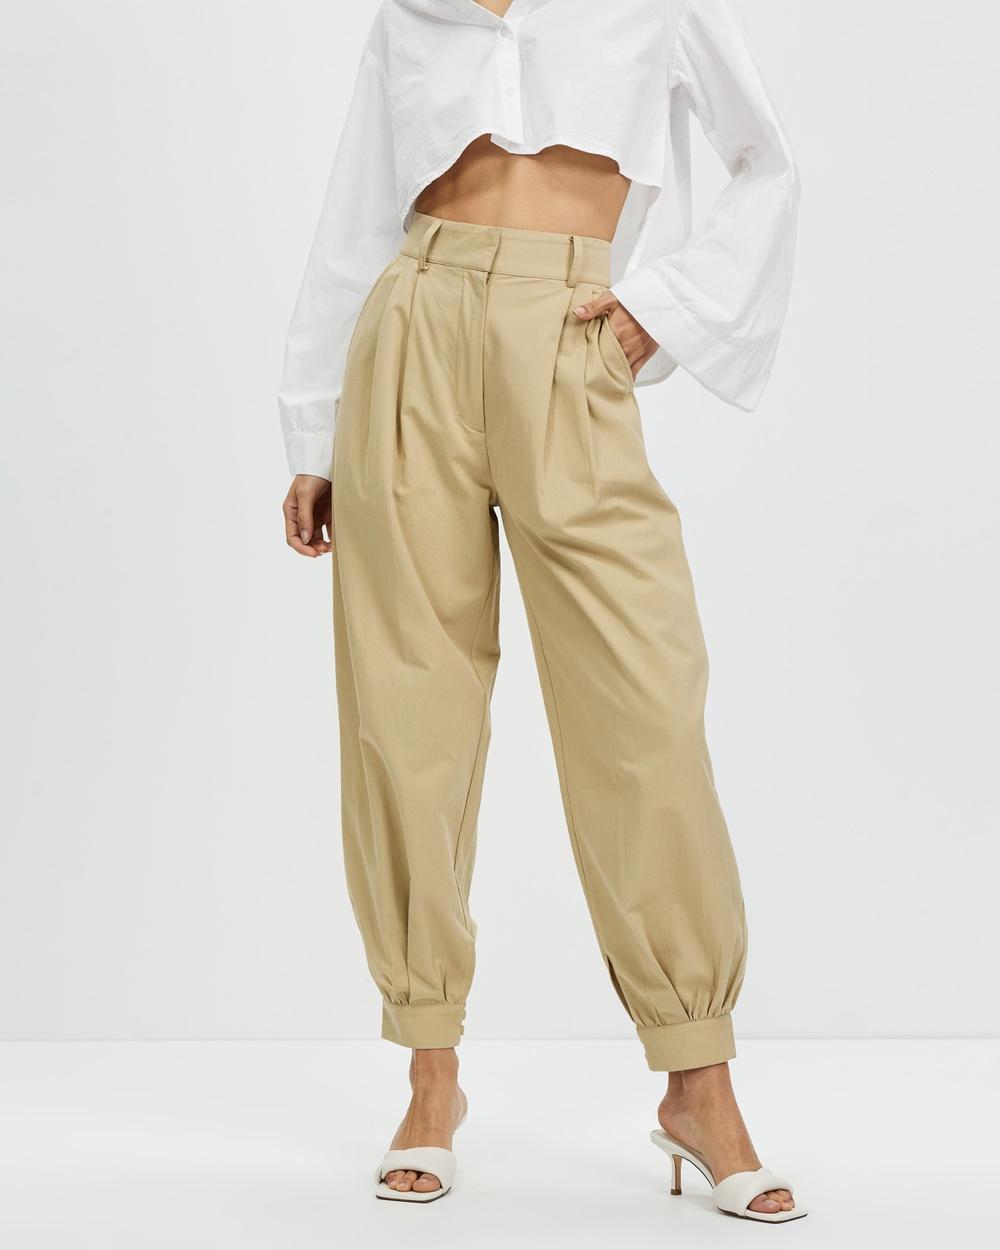 AERE Organic Cotton Cuffed Pants Neutral